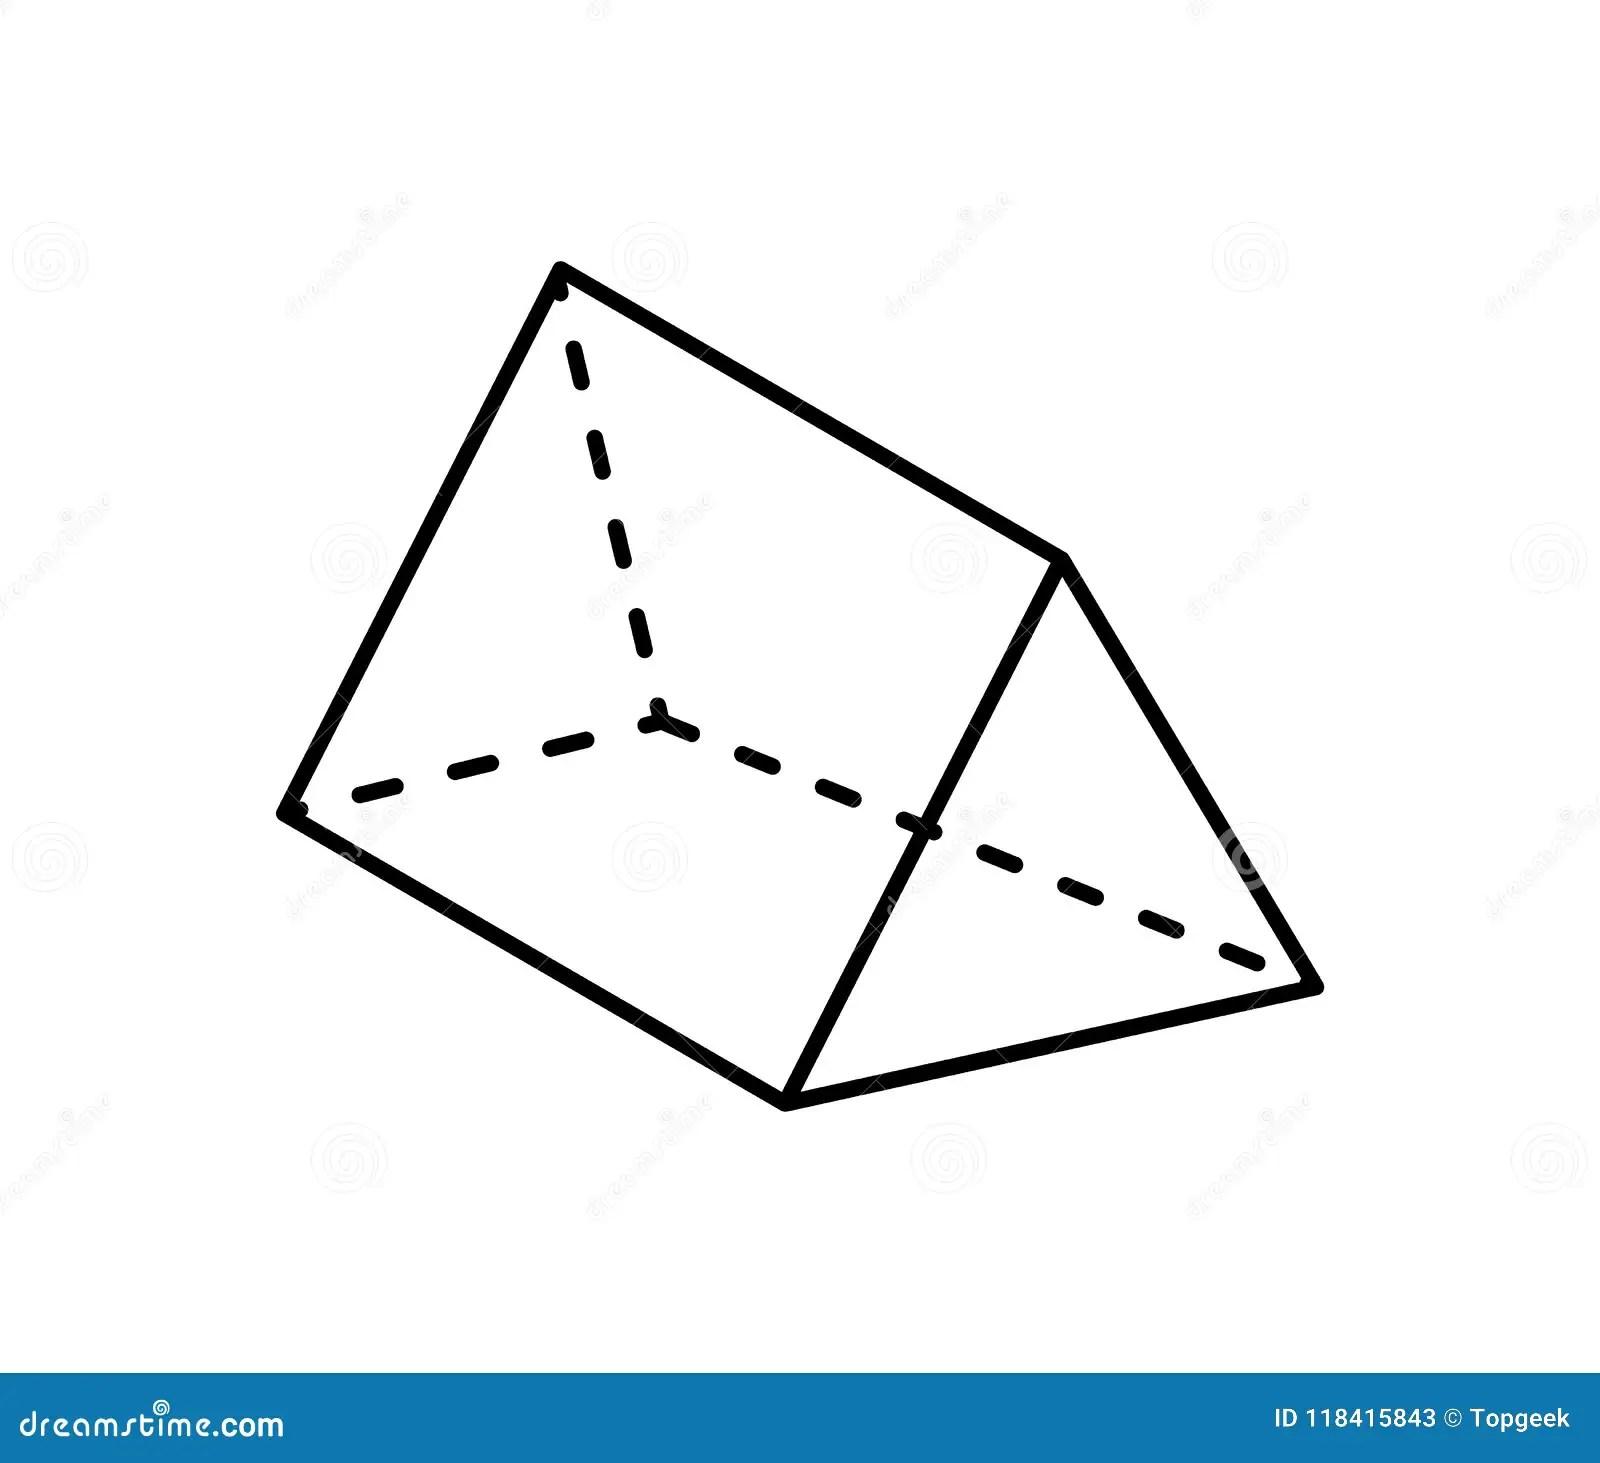 Triangular Prism Geometric Figure In Black Color Stock